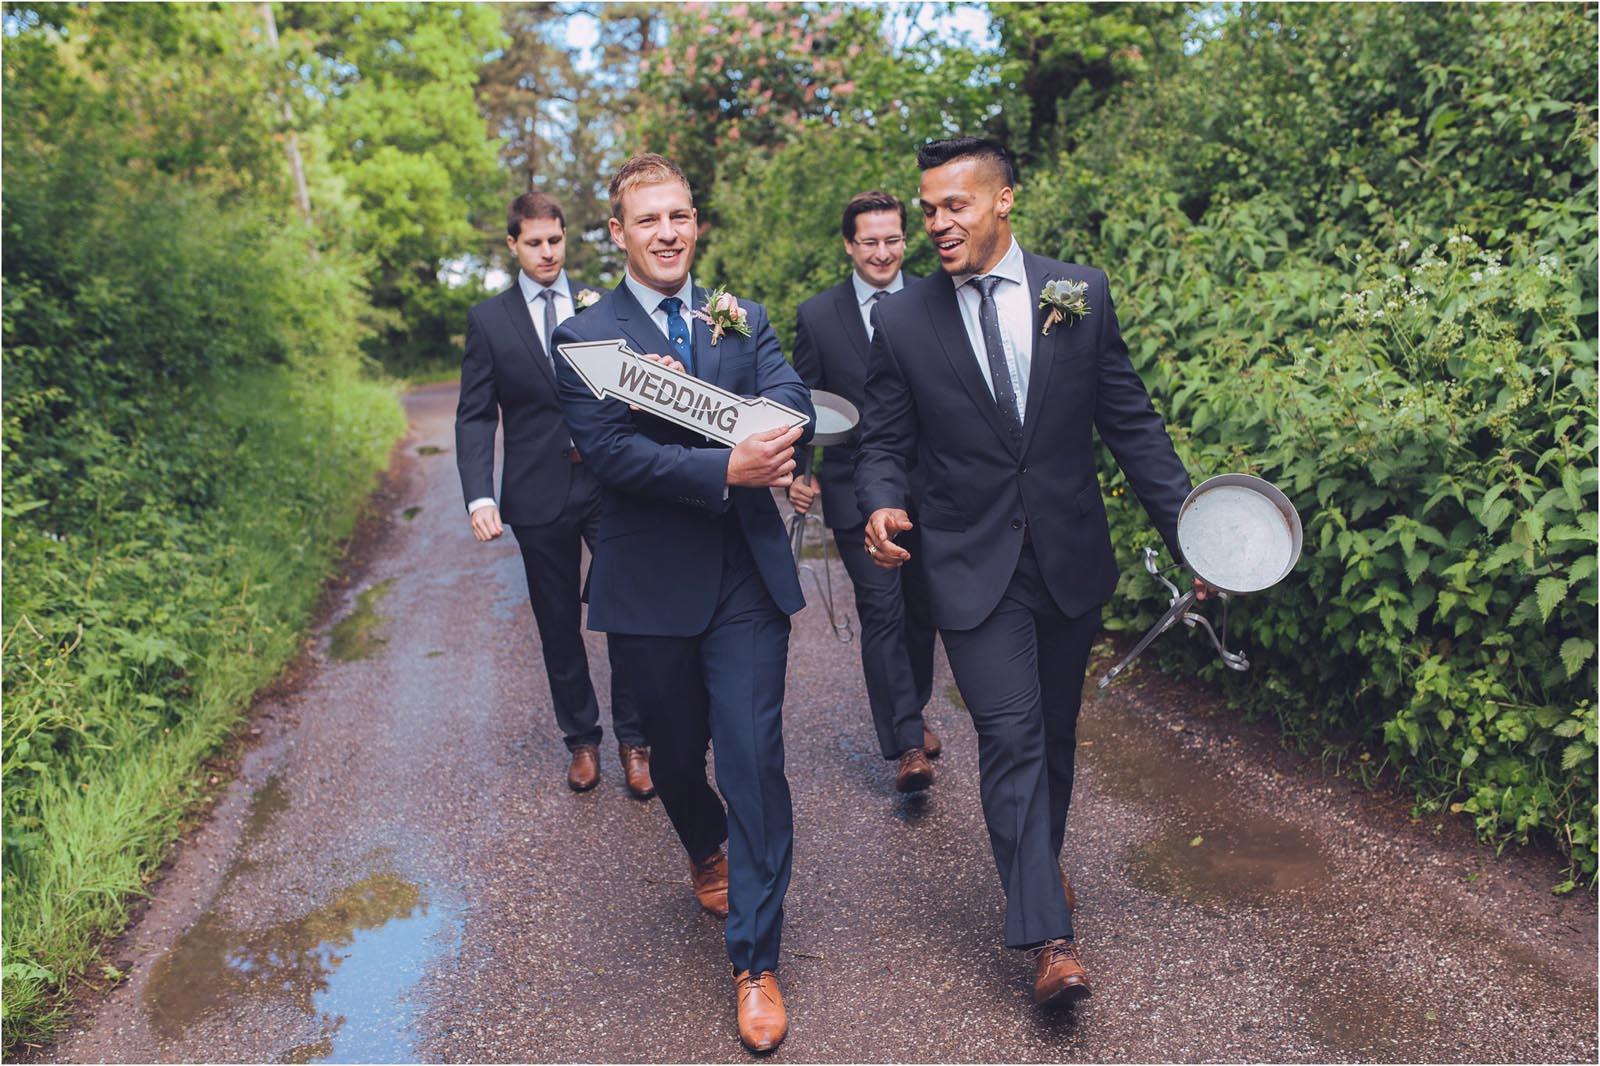 Simon biffen wedding photography 0048